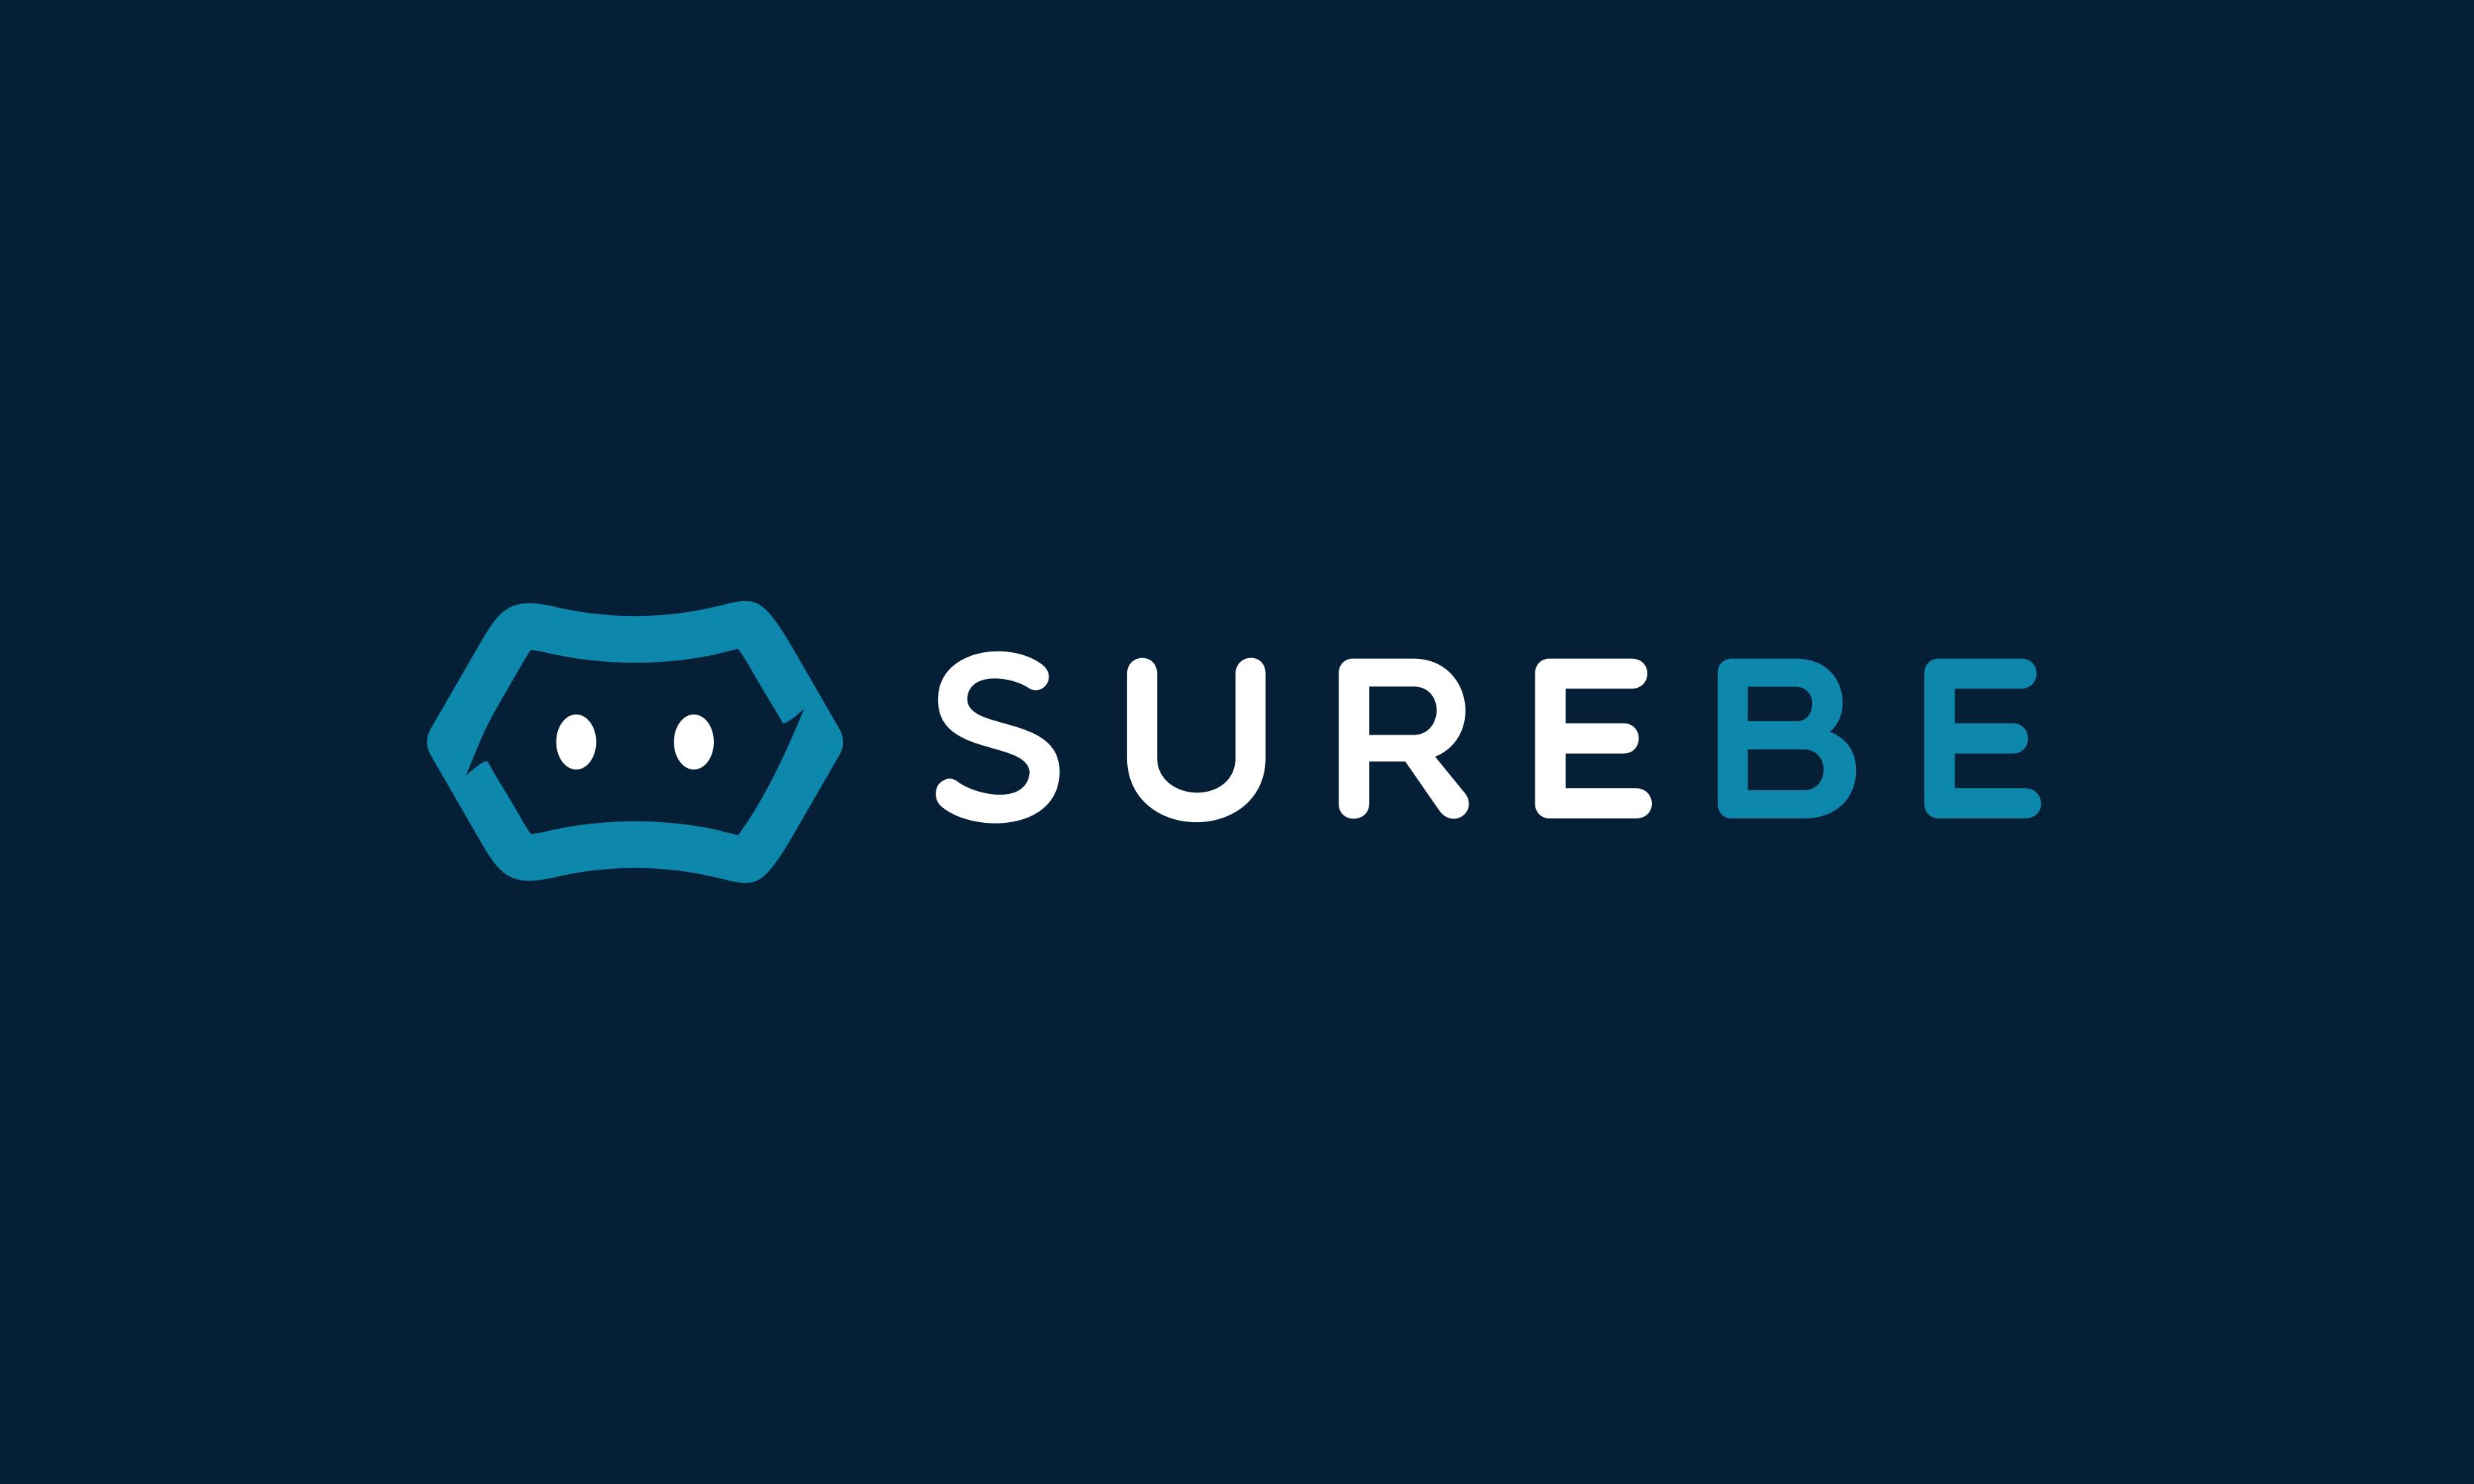 Surebe - Insurance company name for sale